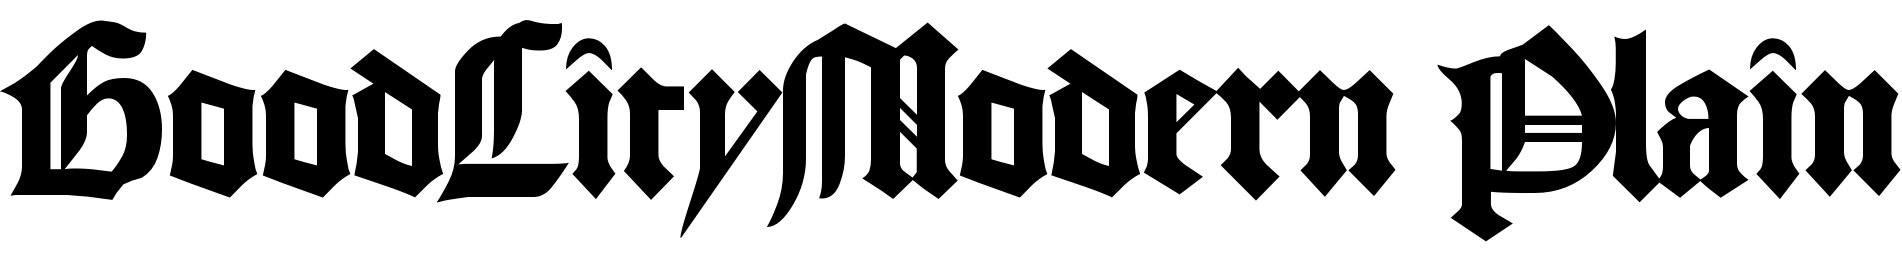 GoodCityModern Plain